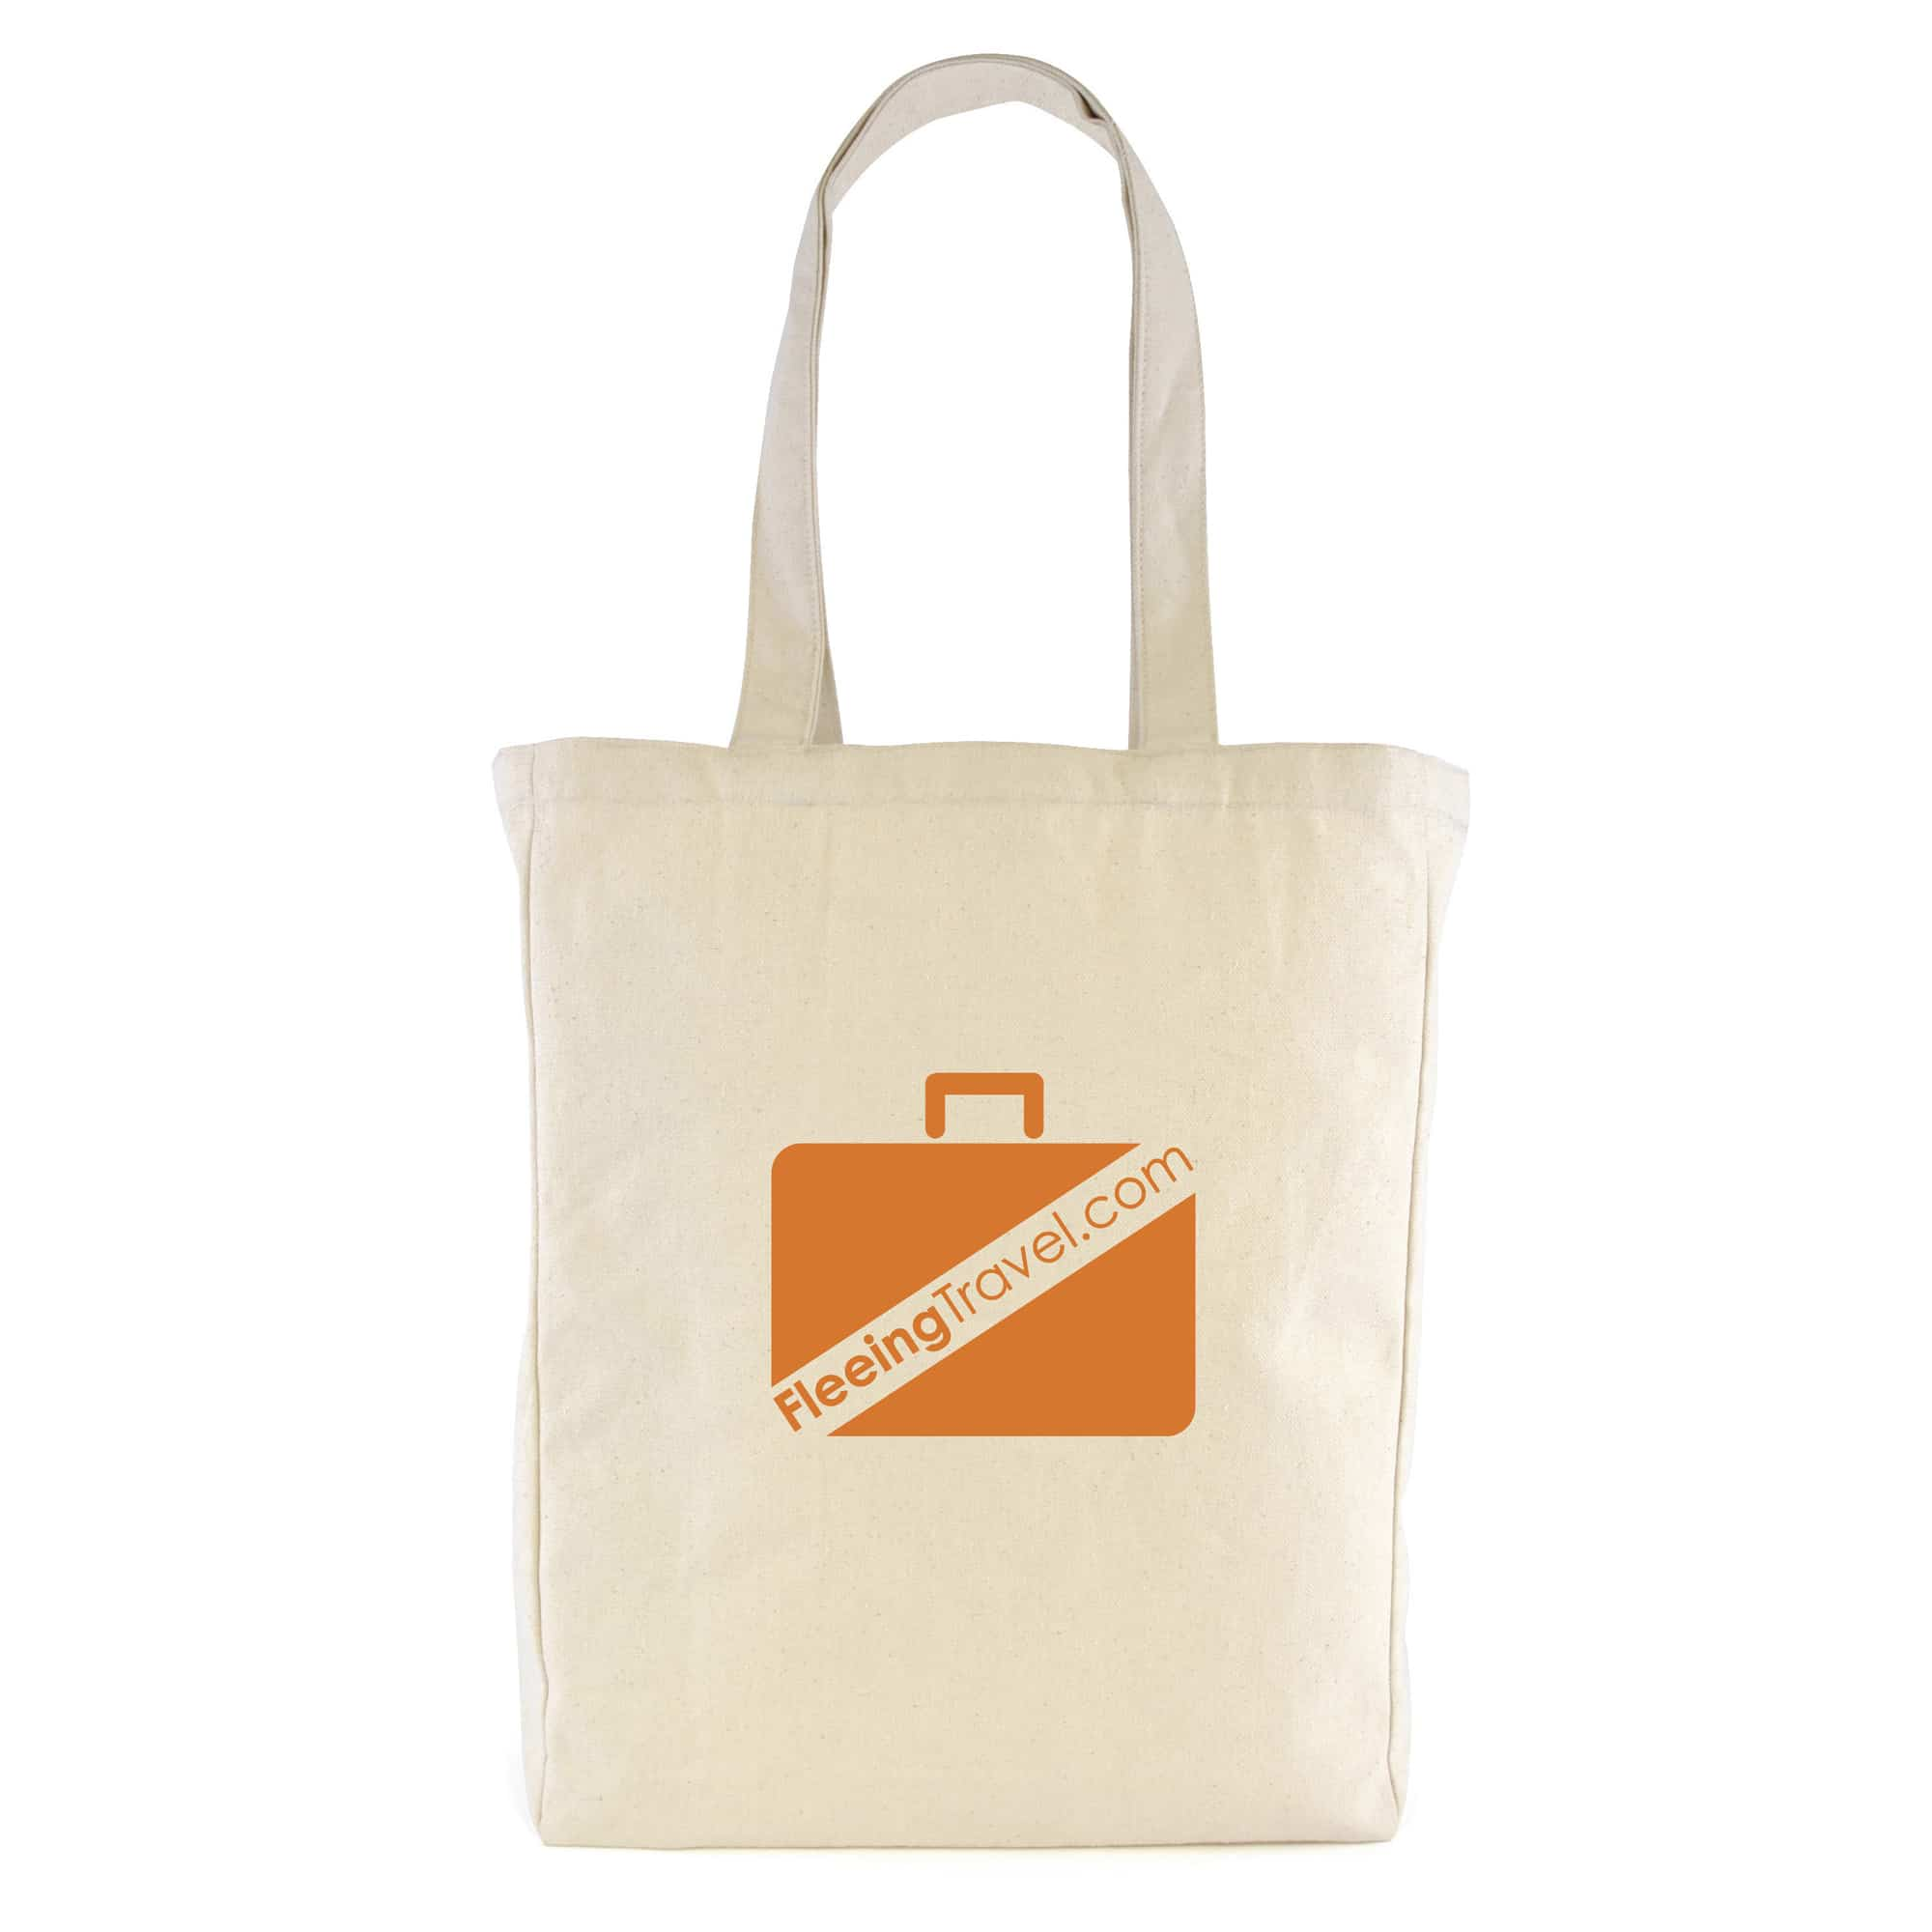 290d28fc8eb 10oz Dunham Canvas Tote Bag